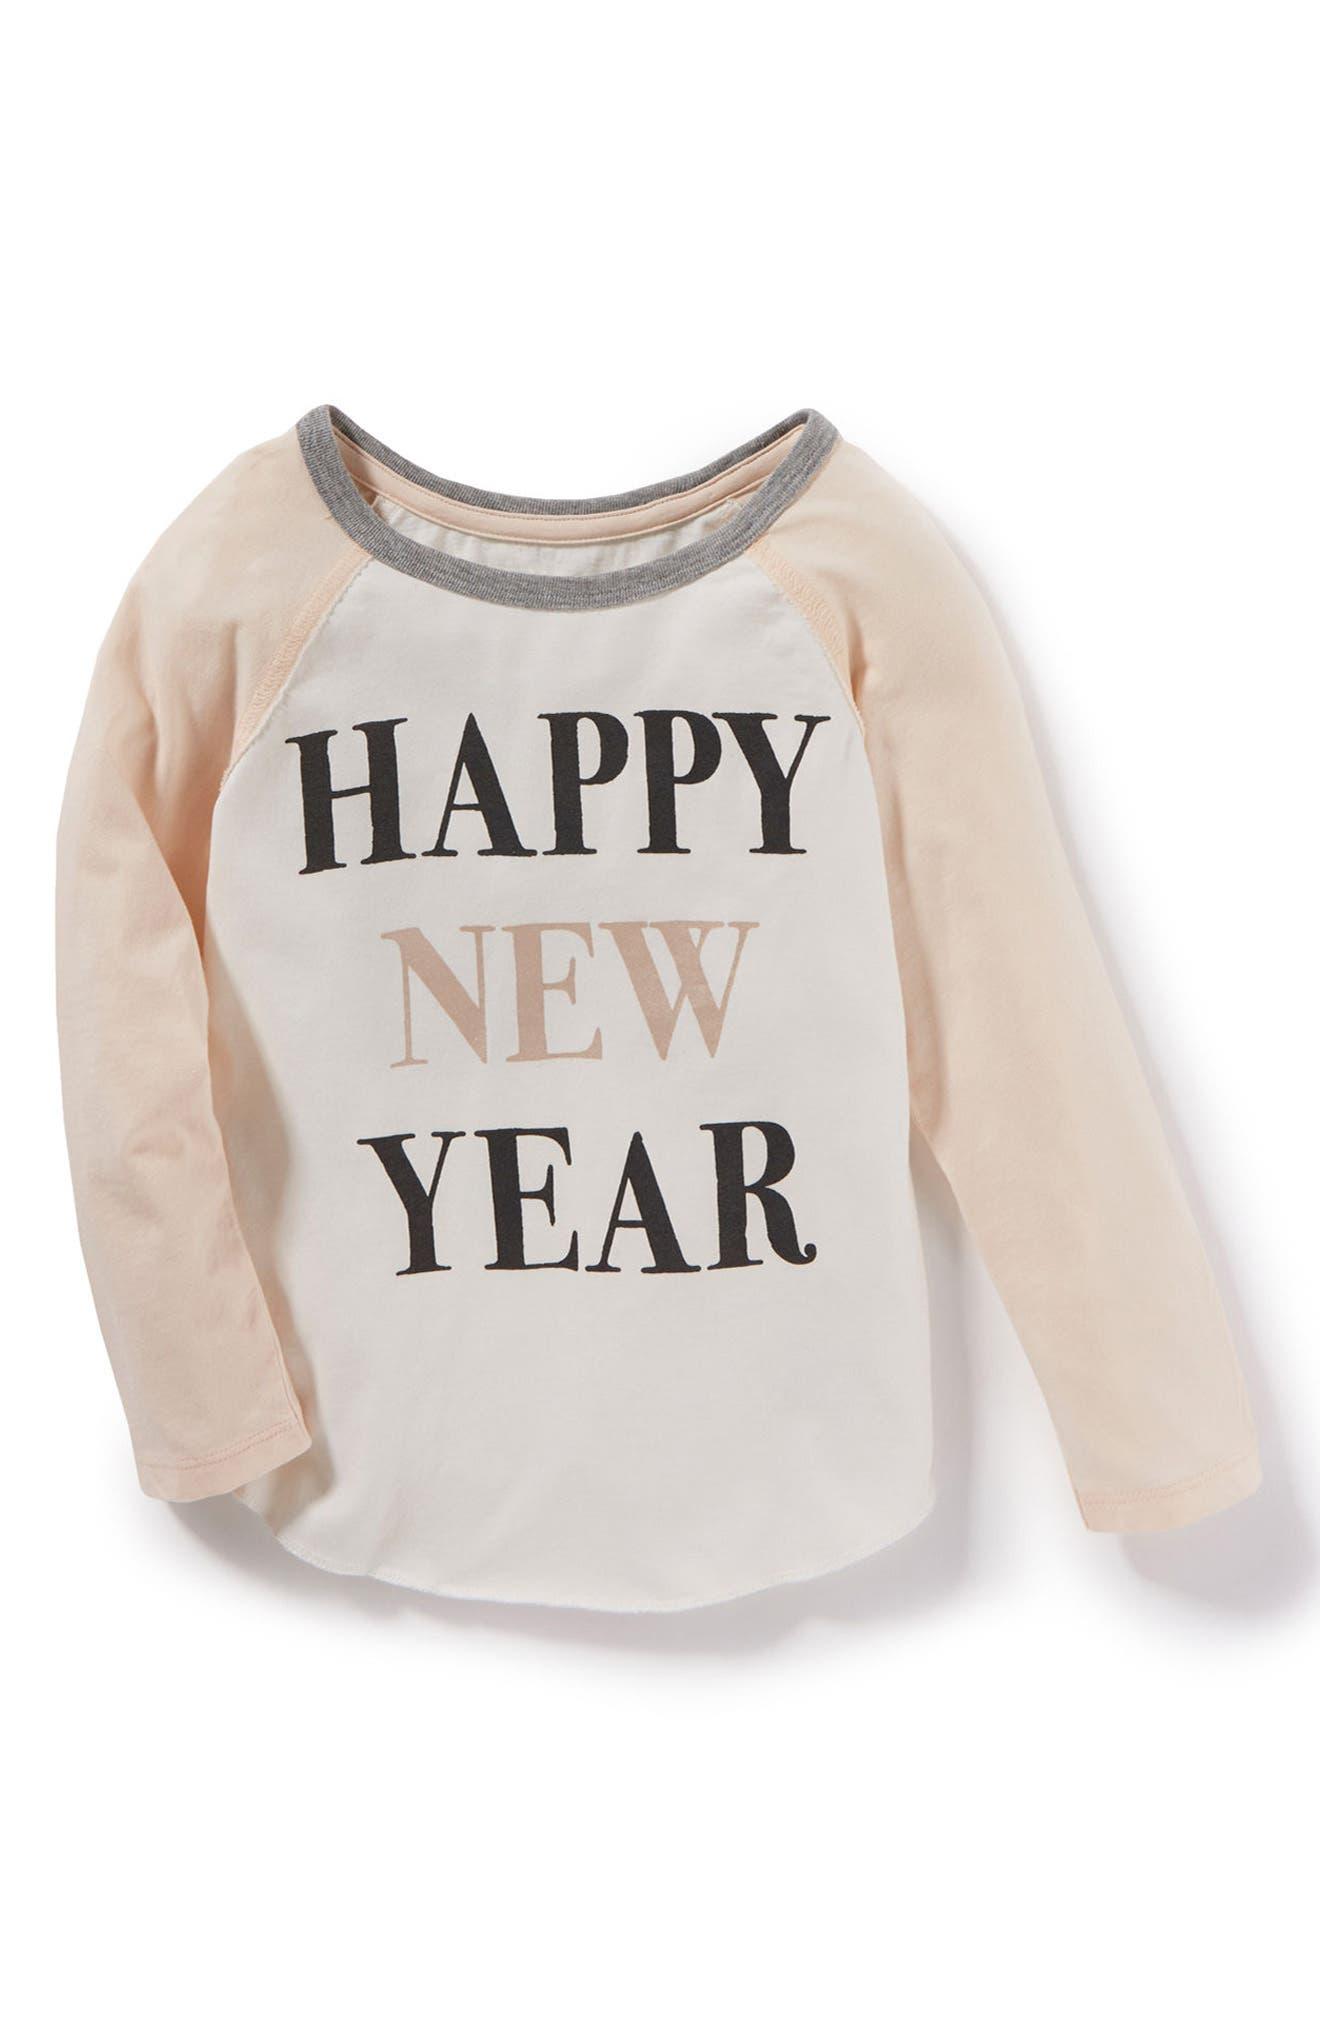 Main Image - Peek Happy New Year Graphic Tee (Toddler Girls, Little Girls & Big Girls)